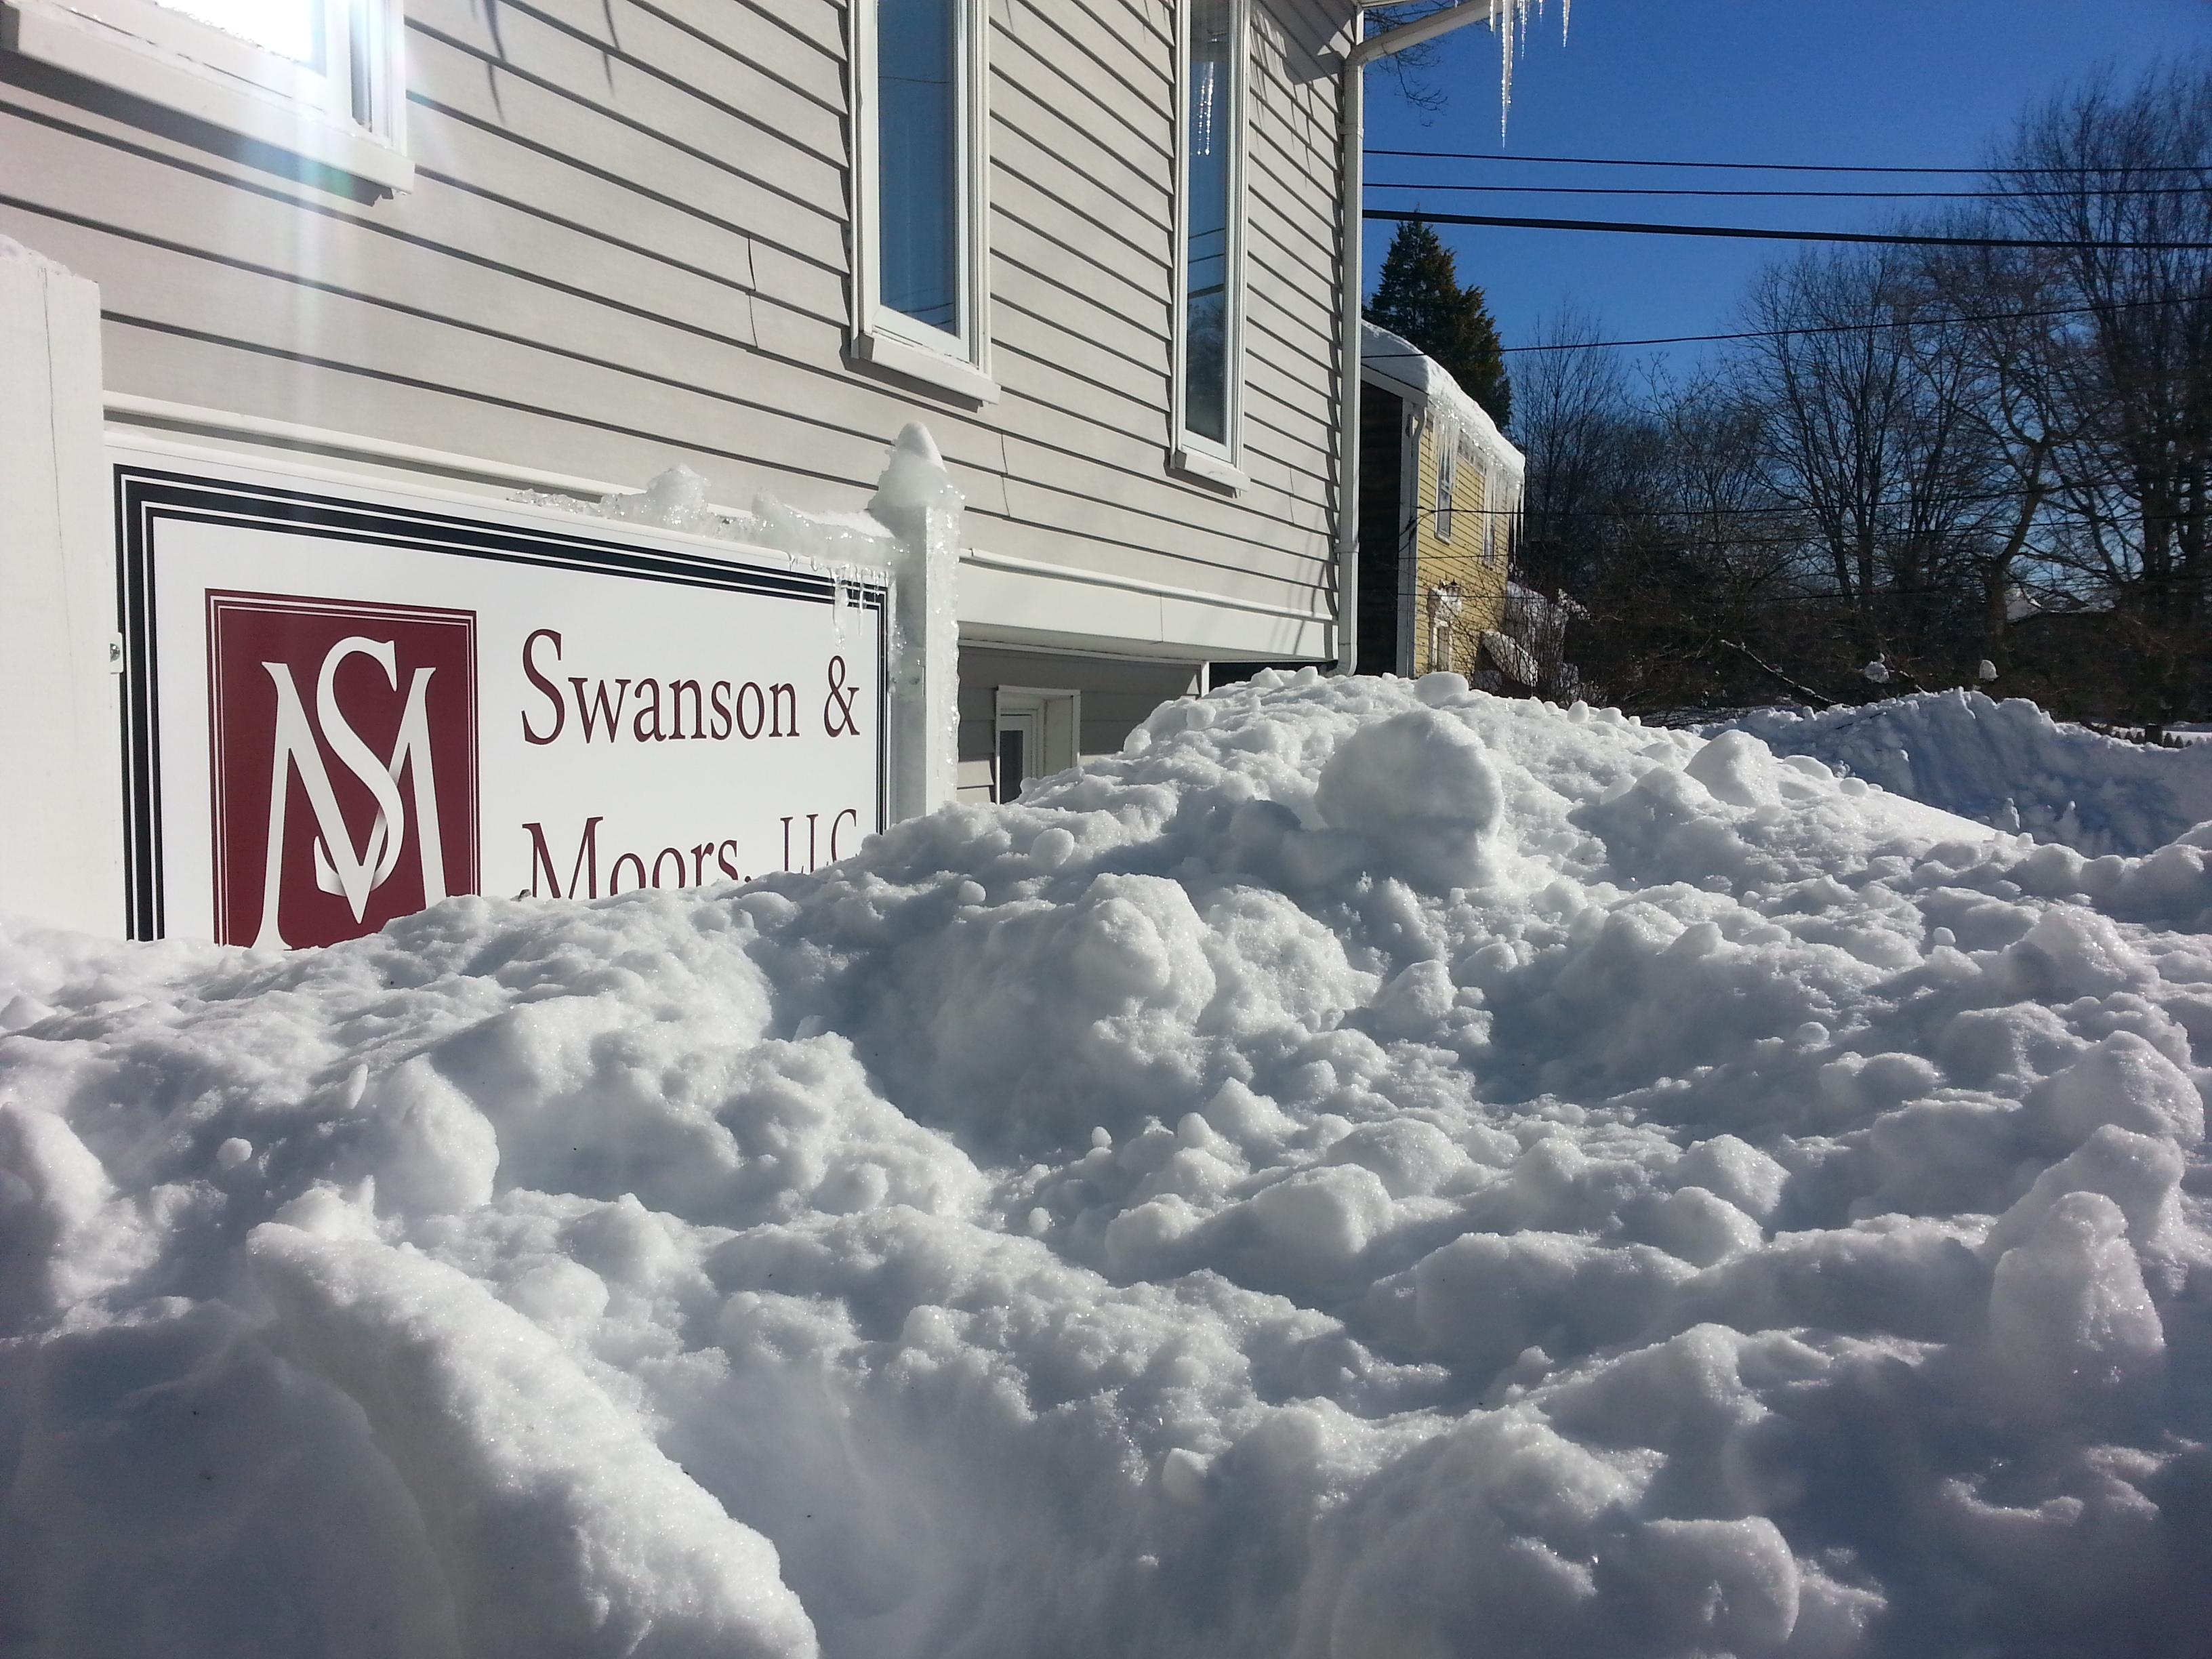 Swanson & Moors, LLC